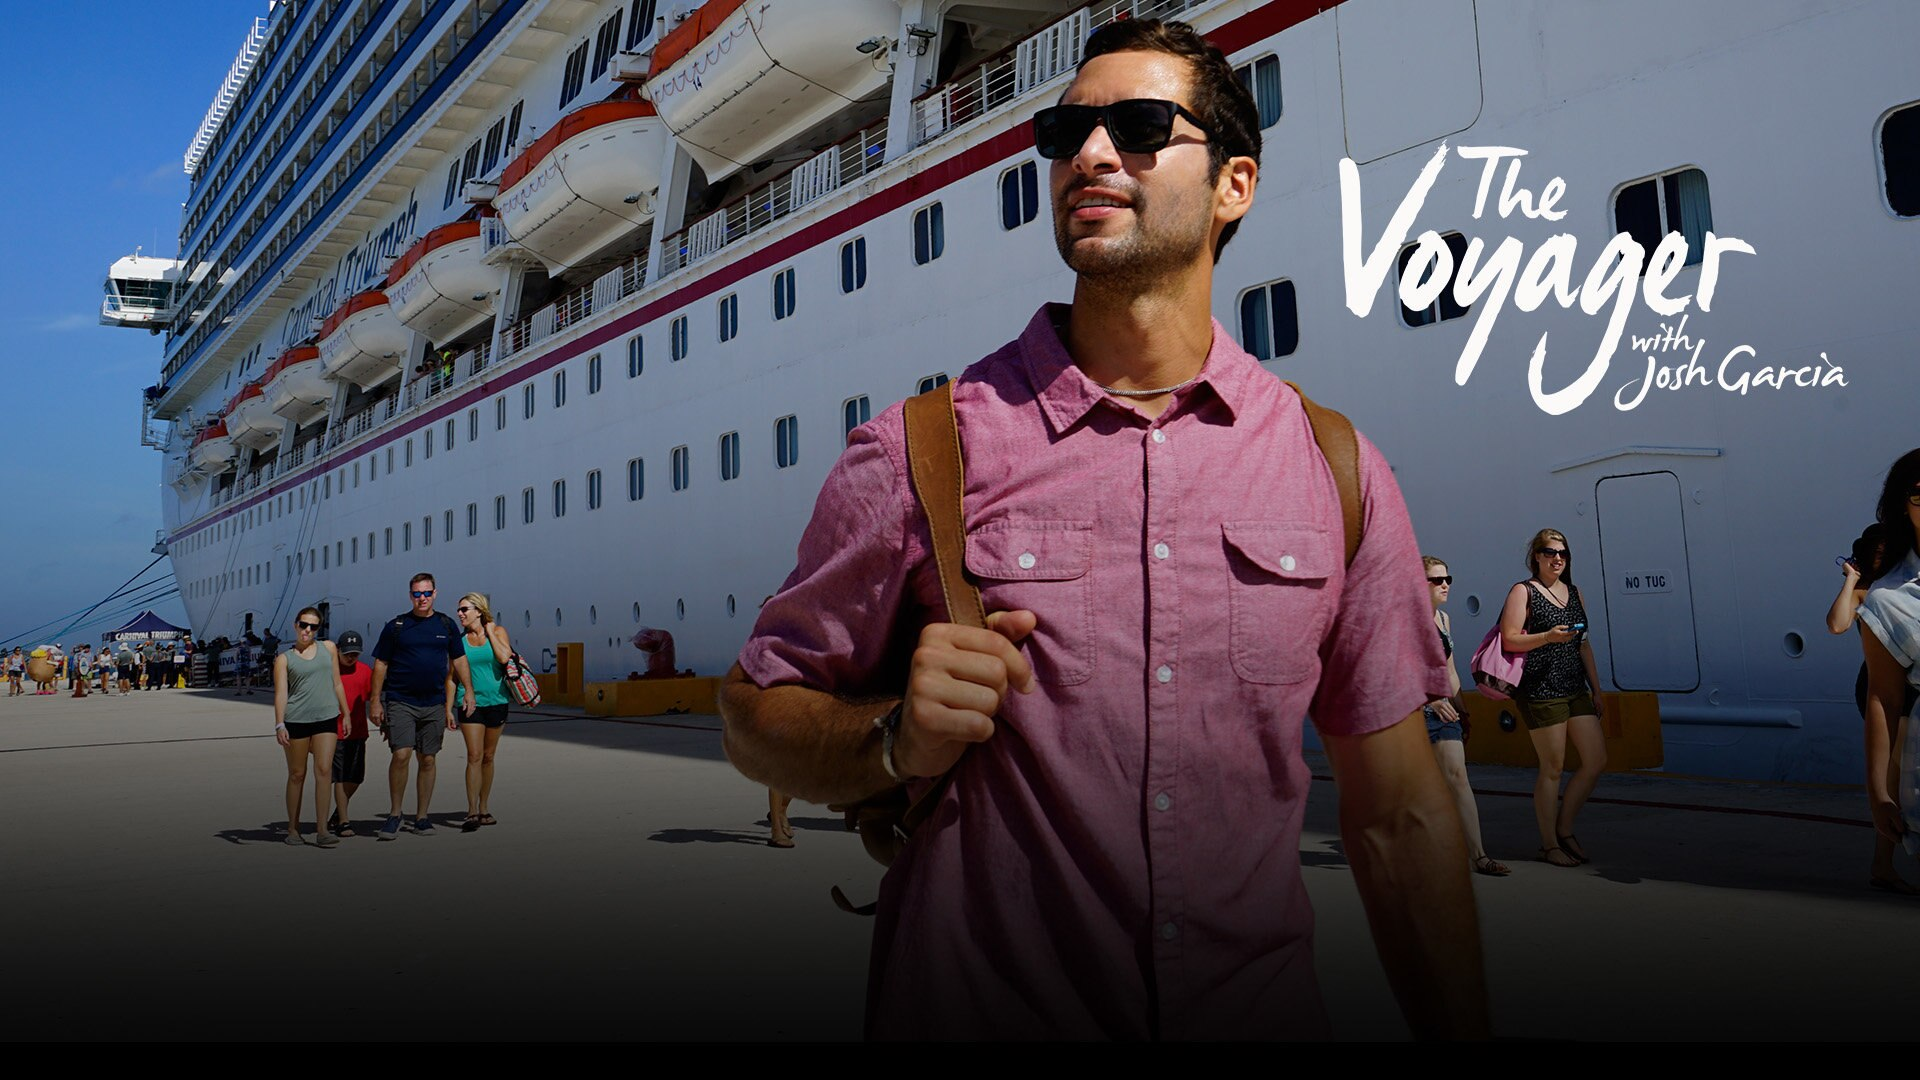 The Voyager with Josh Garcia - hero